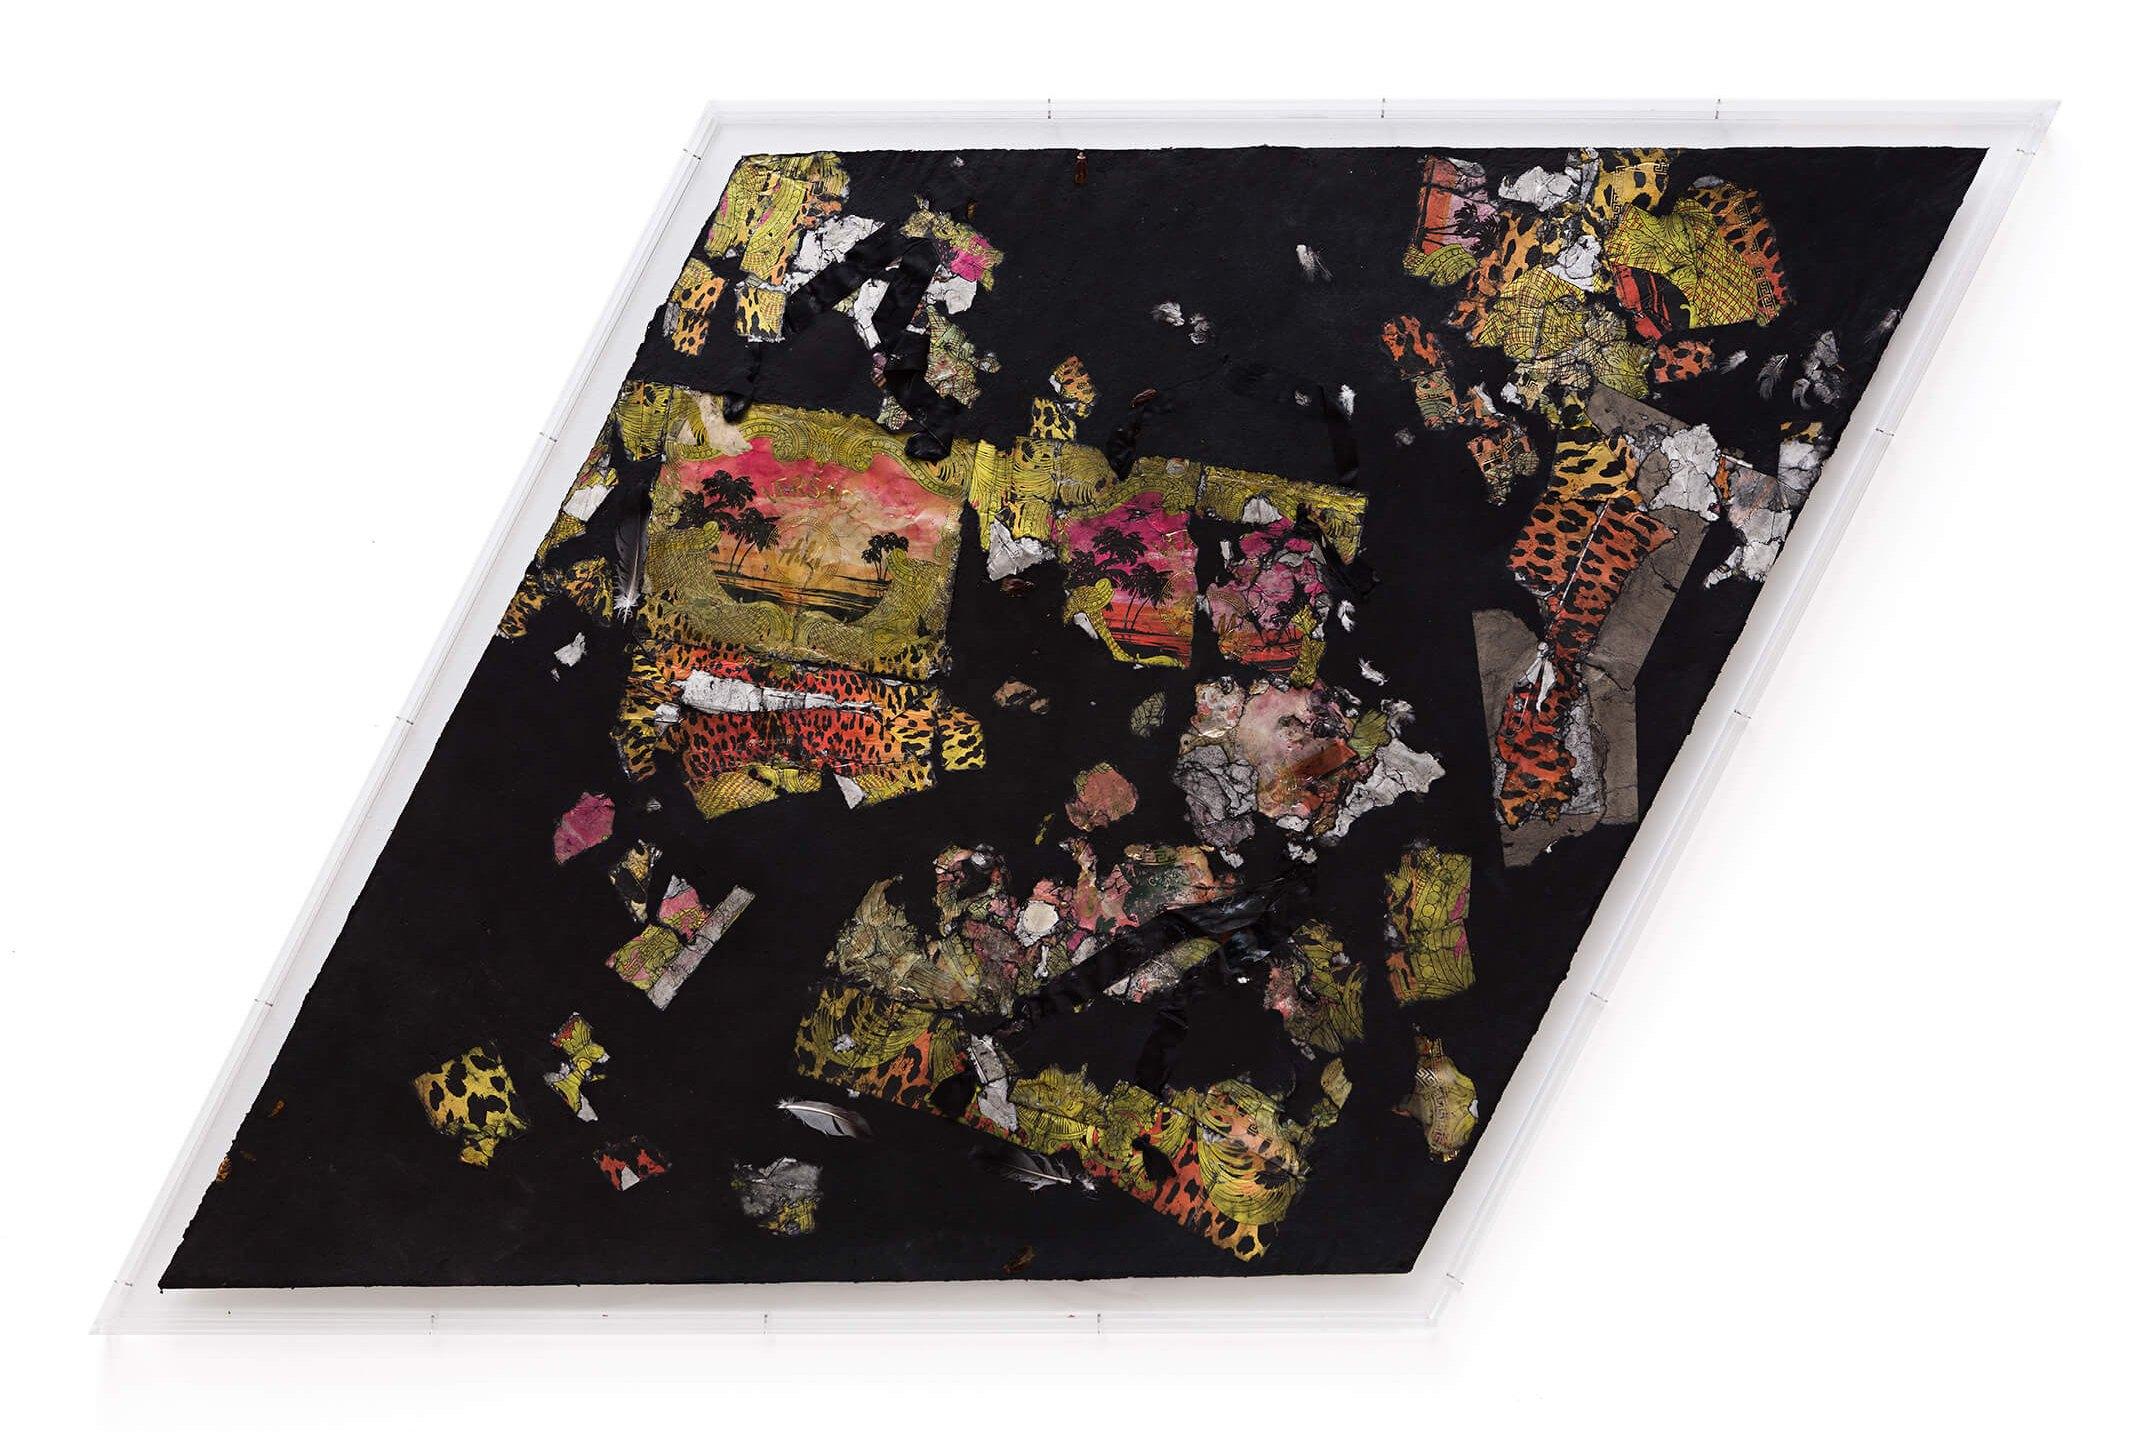 Stewart Uoo,<em>Untitled (Versace/H&M Medium Black II), </em>2015<em>,</em>cotton rag denin, paper shopping bags, flies (Calliphora vomitoria), cockroaches (Periplaneta americana), pigeons (Columba livia) feathers, pigment, polyurethane resin, synthetic fibers, dust,111,75 × 109,2 × 0,95 cm - Mendes Wood DM